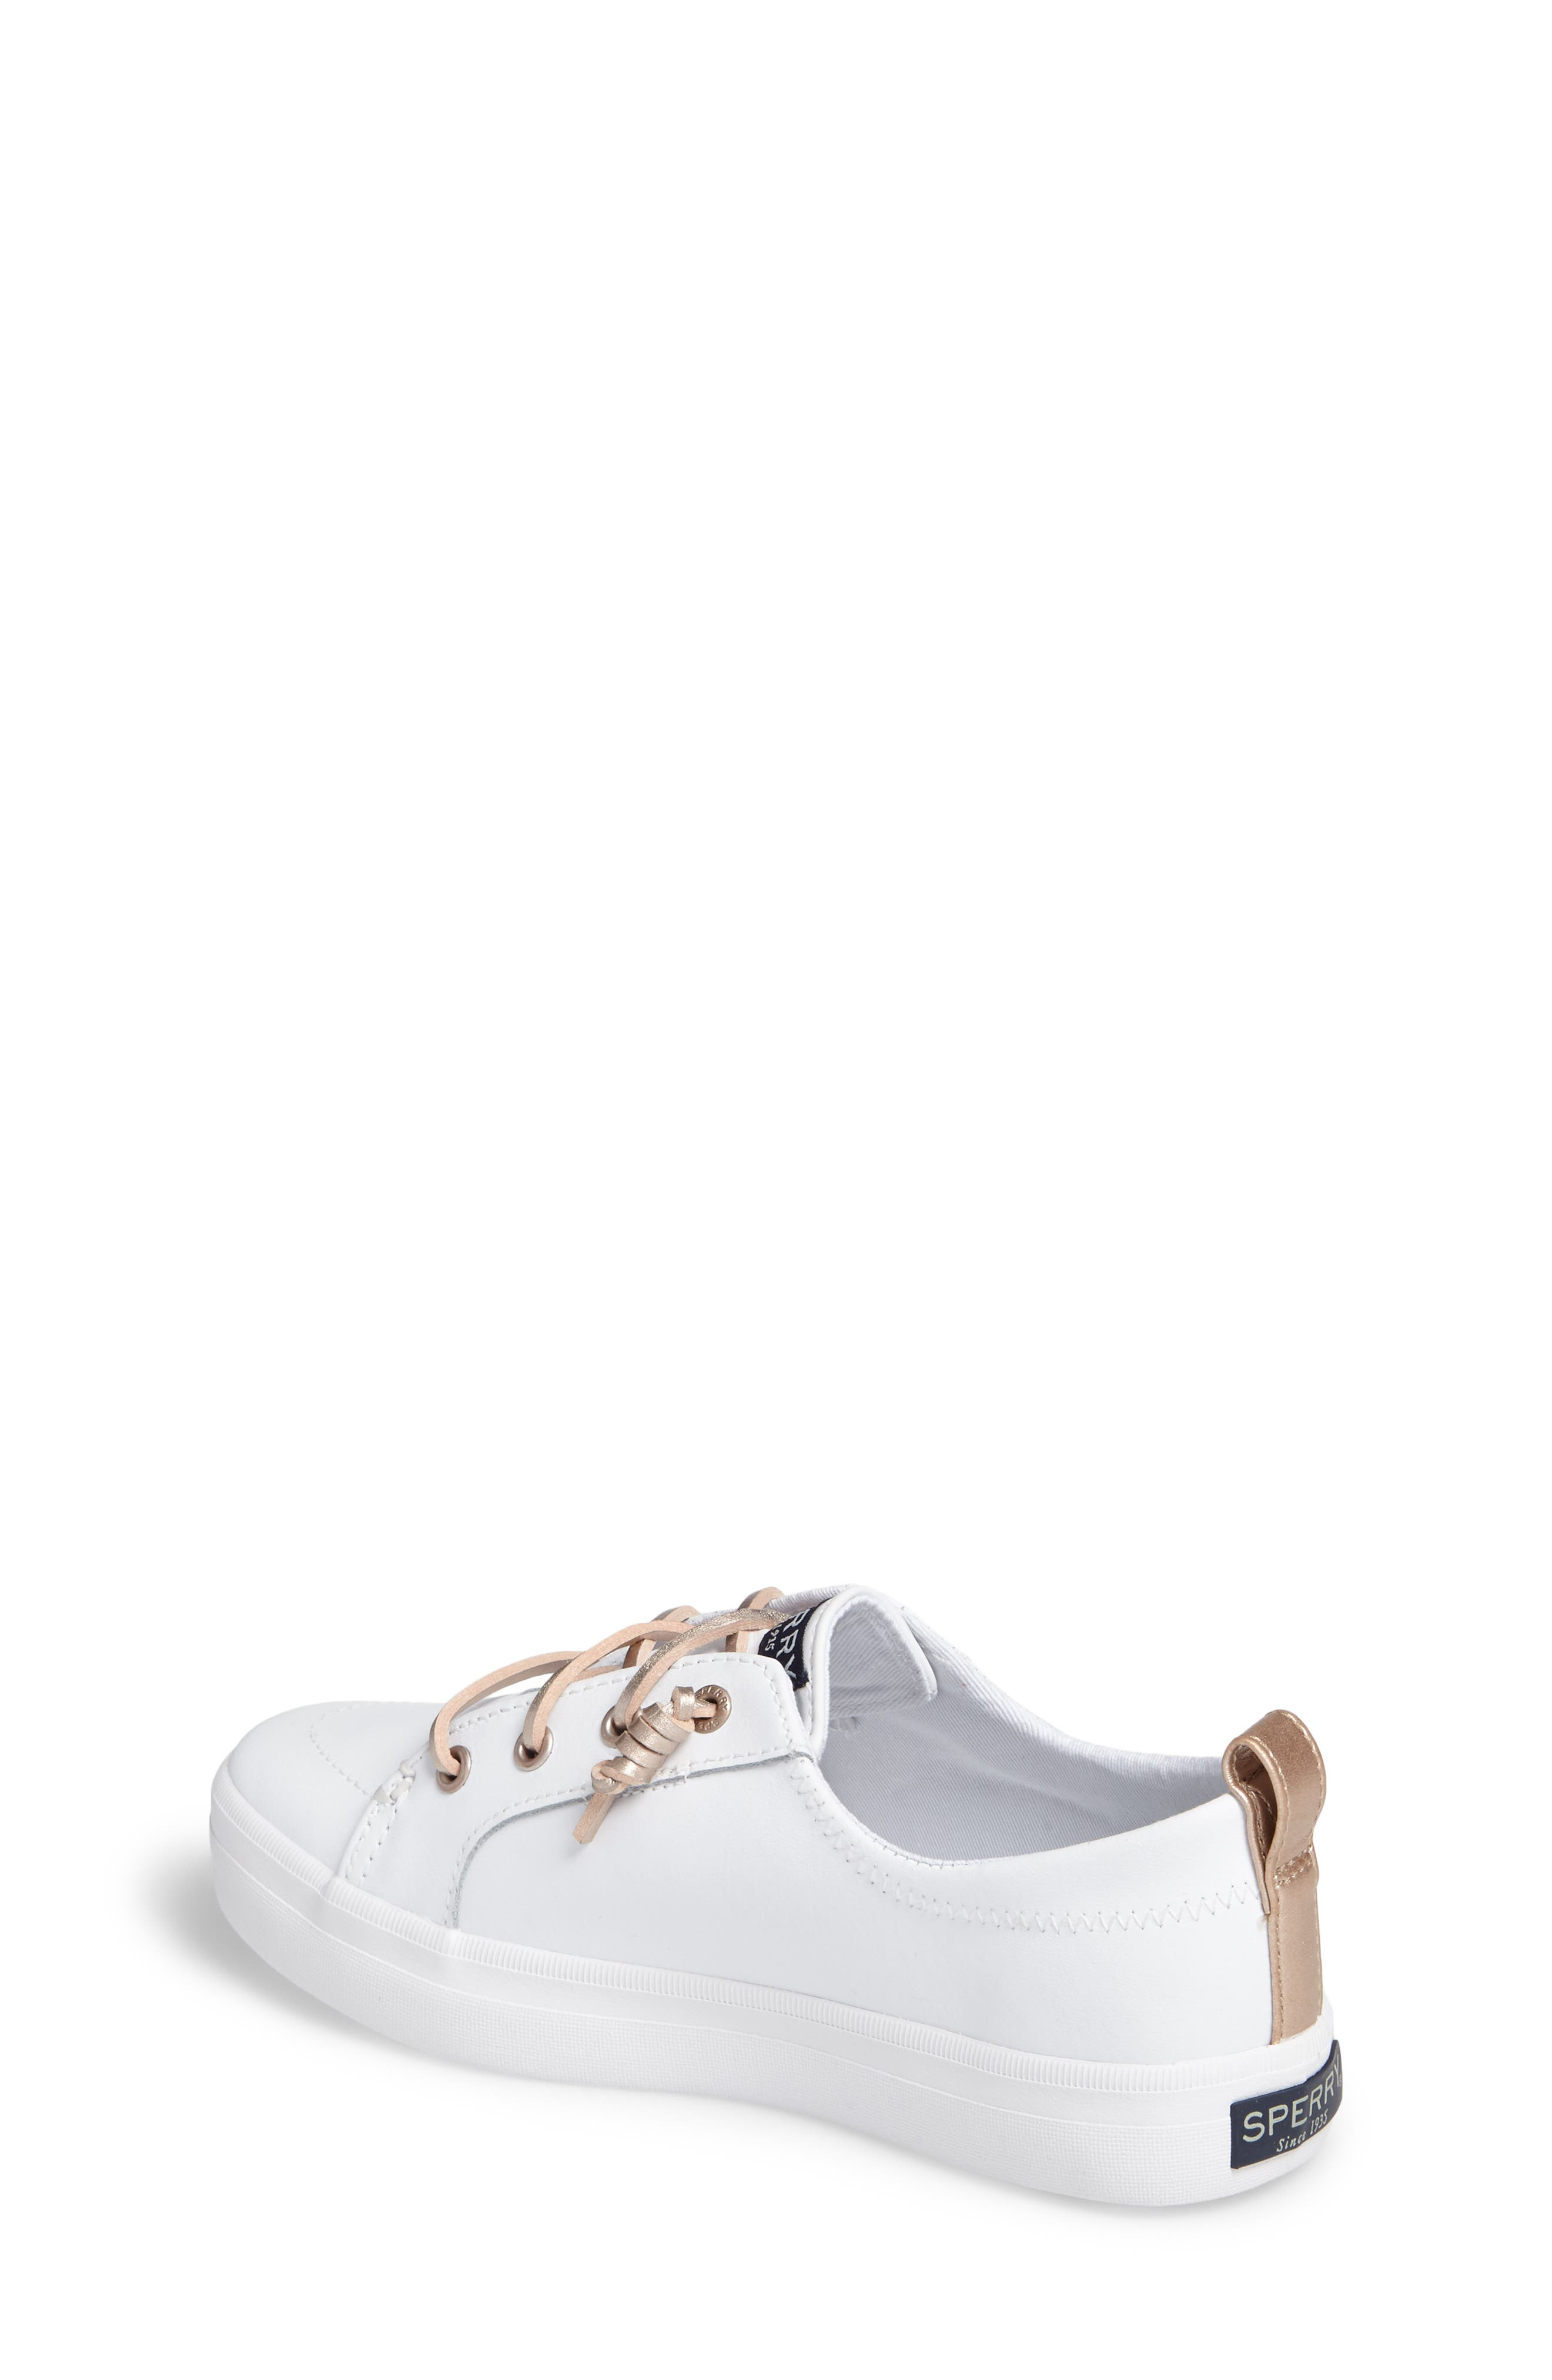 Sperry Crest Vibe Sneaker,                             Alternate thumbnail 2, color,                             WHITE LEATHER